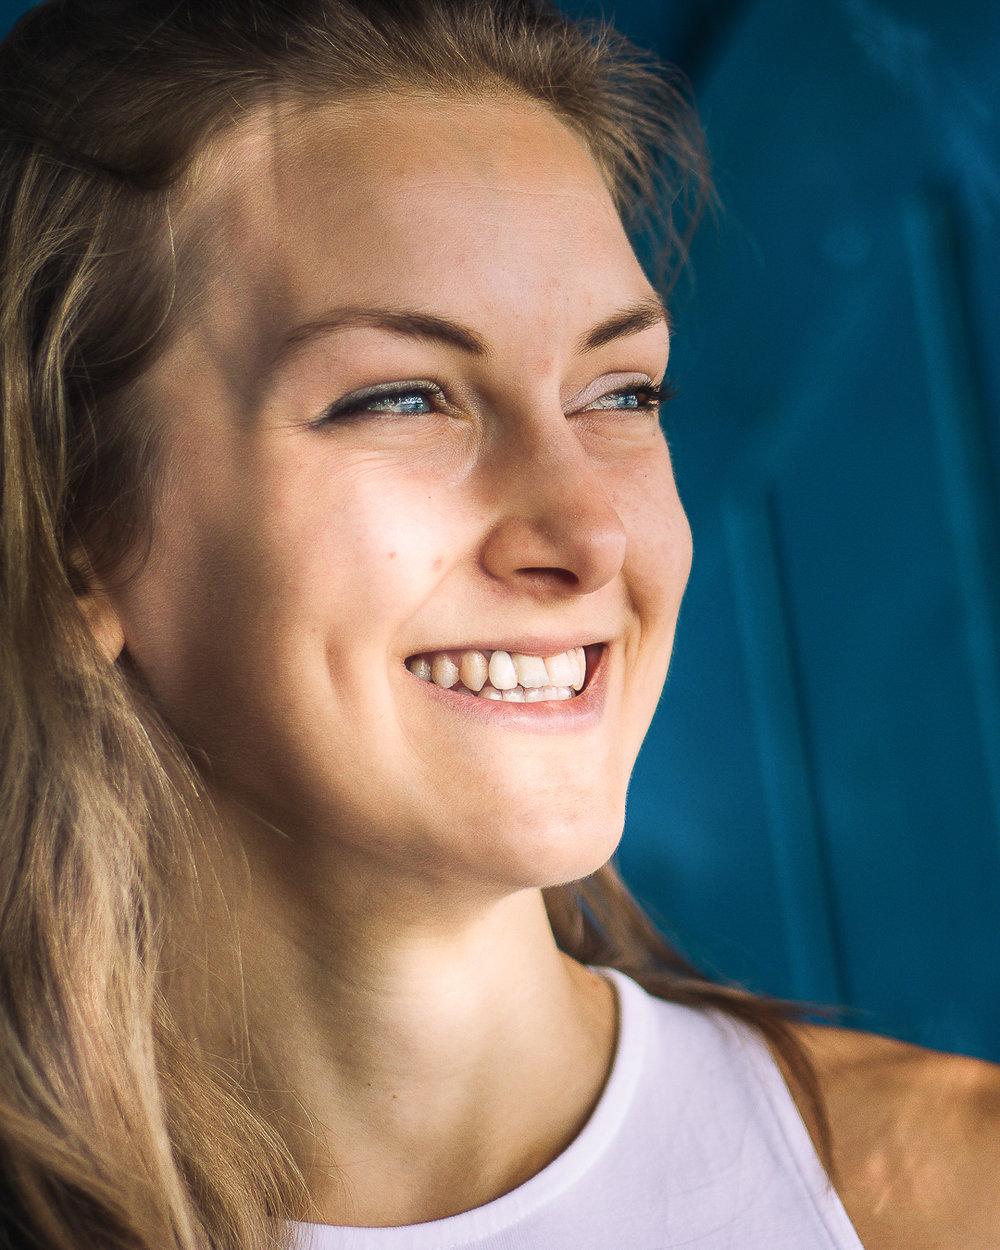 Earthly Biotics Cognitive Supplement Athlete Hebe Burton